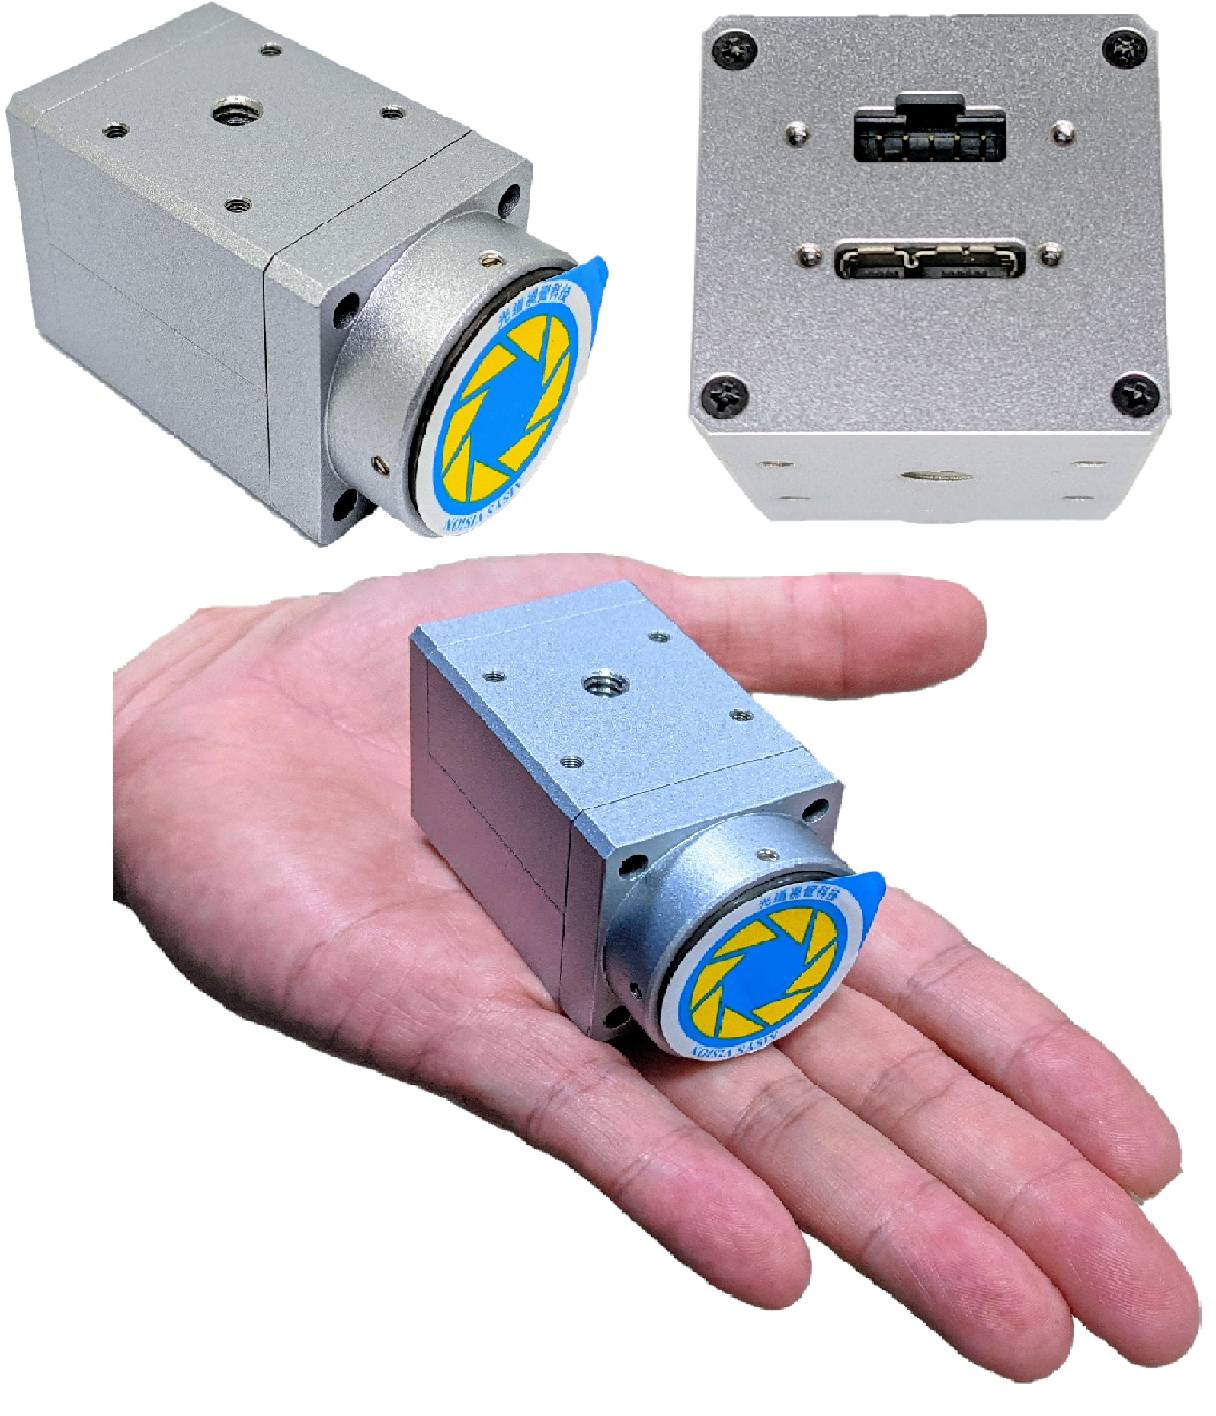 CYCLOPS SU530FC-62攝影機-5.3M像素、非同步式、彩色、內建LED燈源控制器